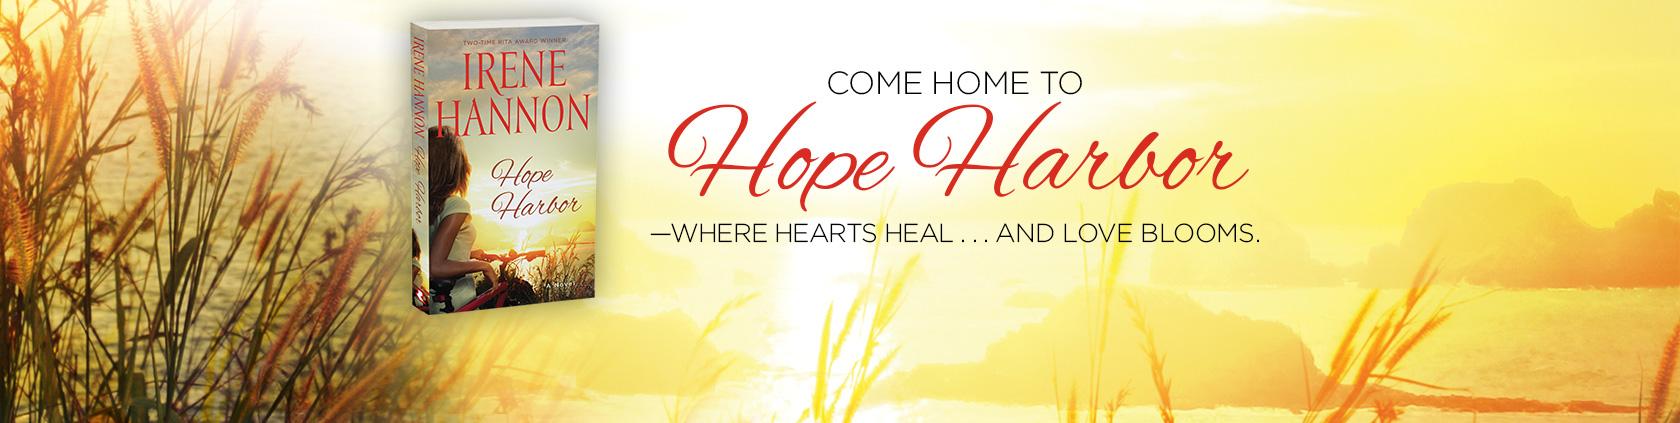 Hope Harbor header